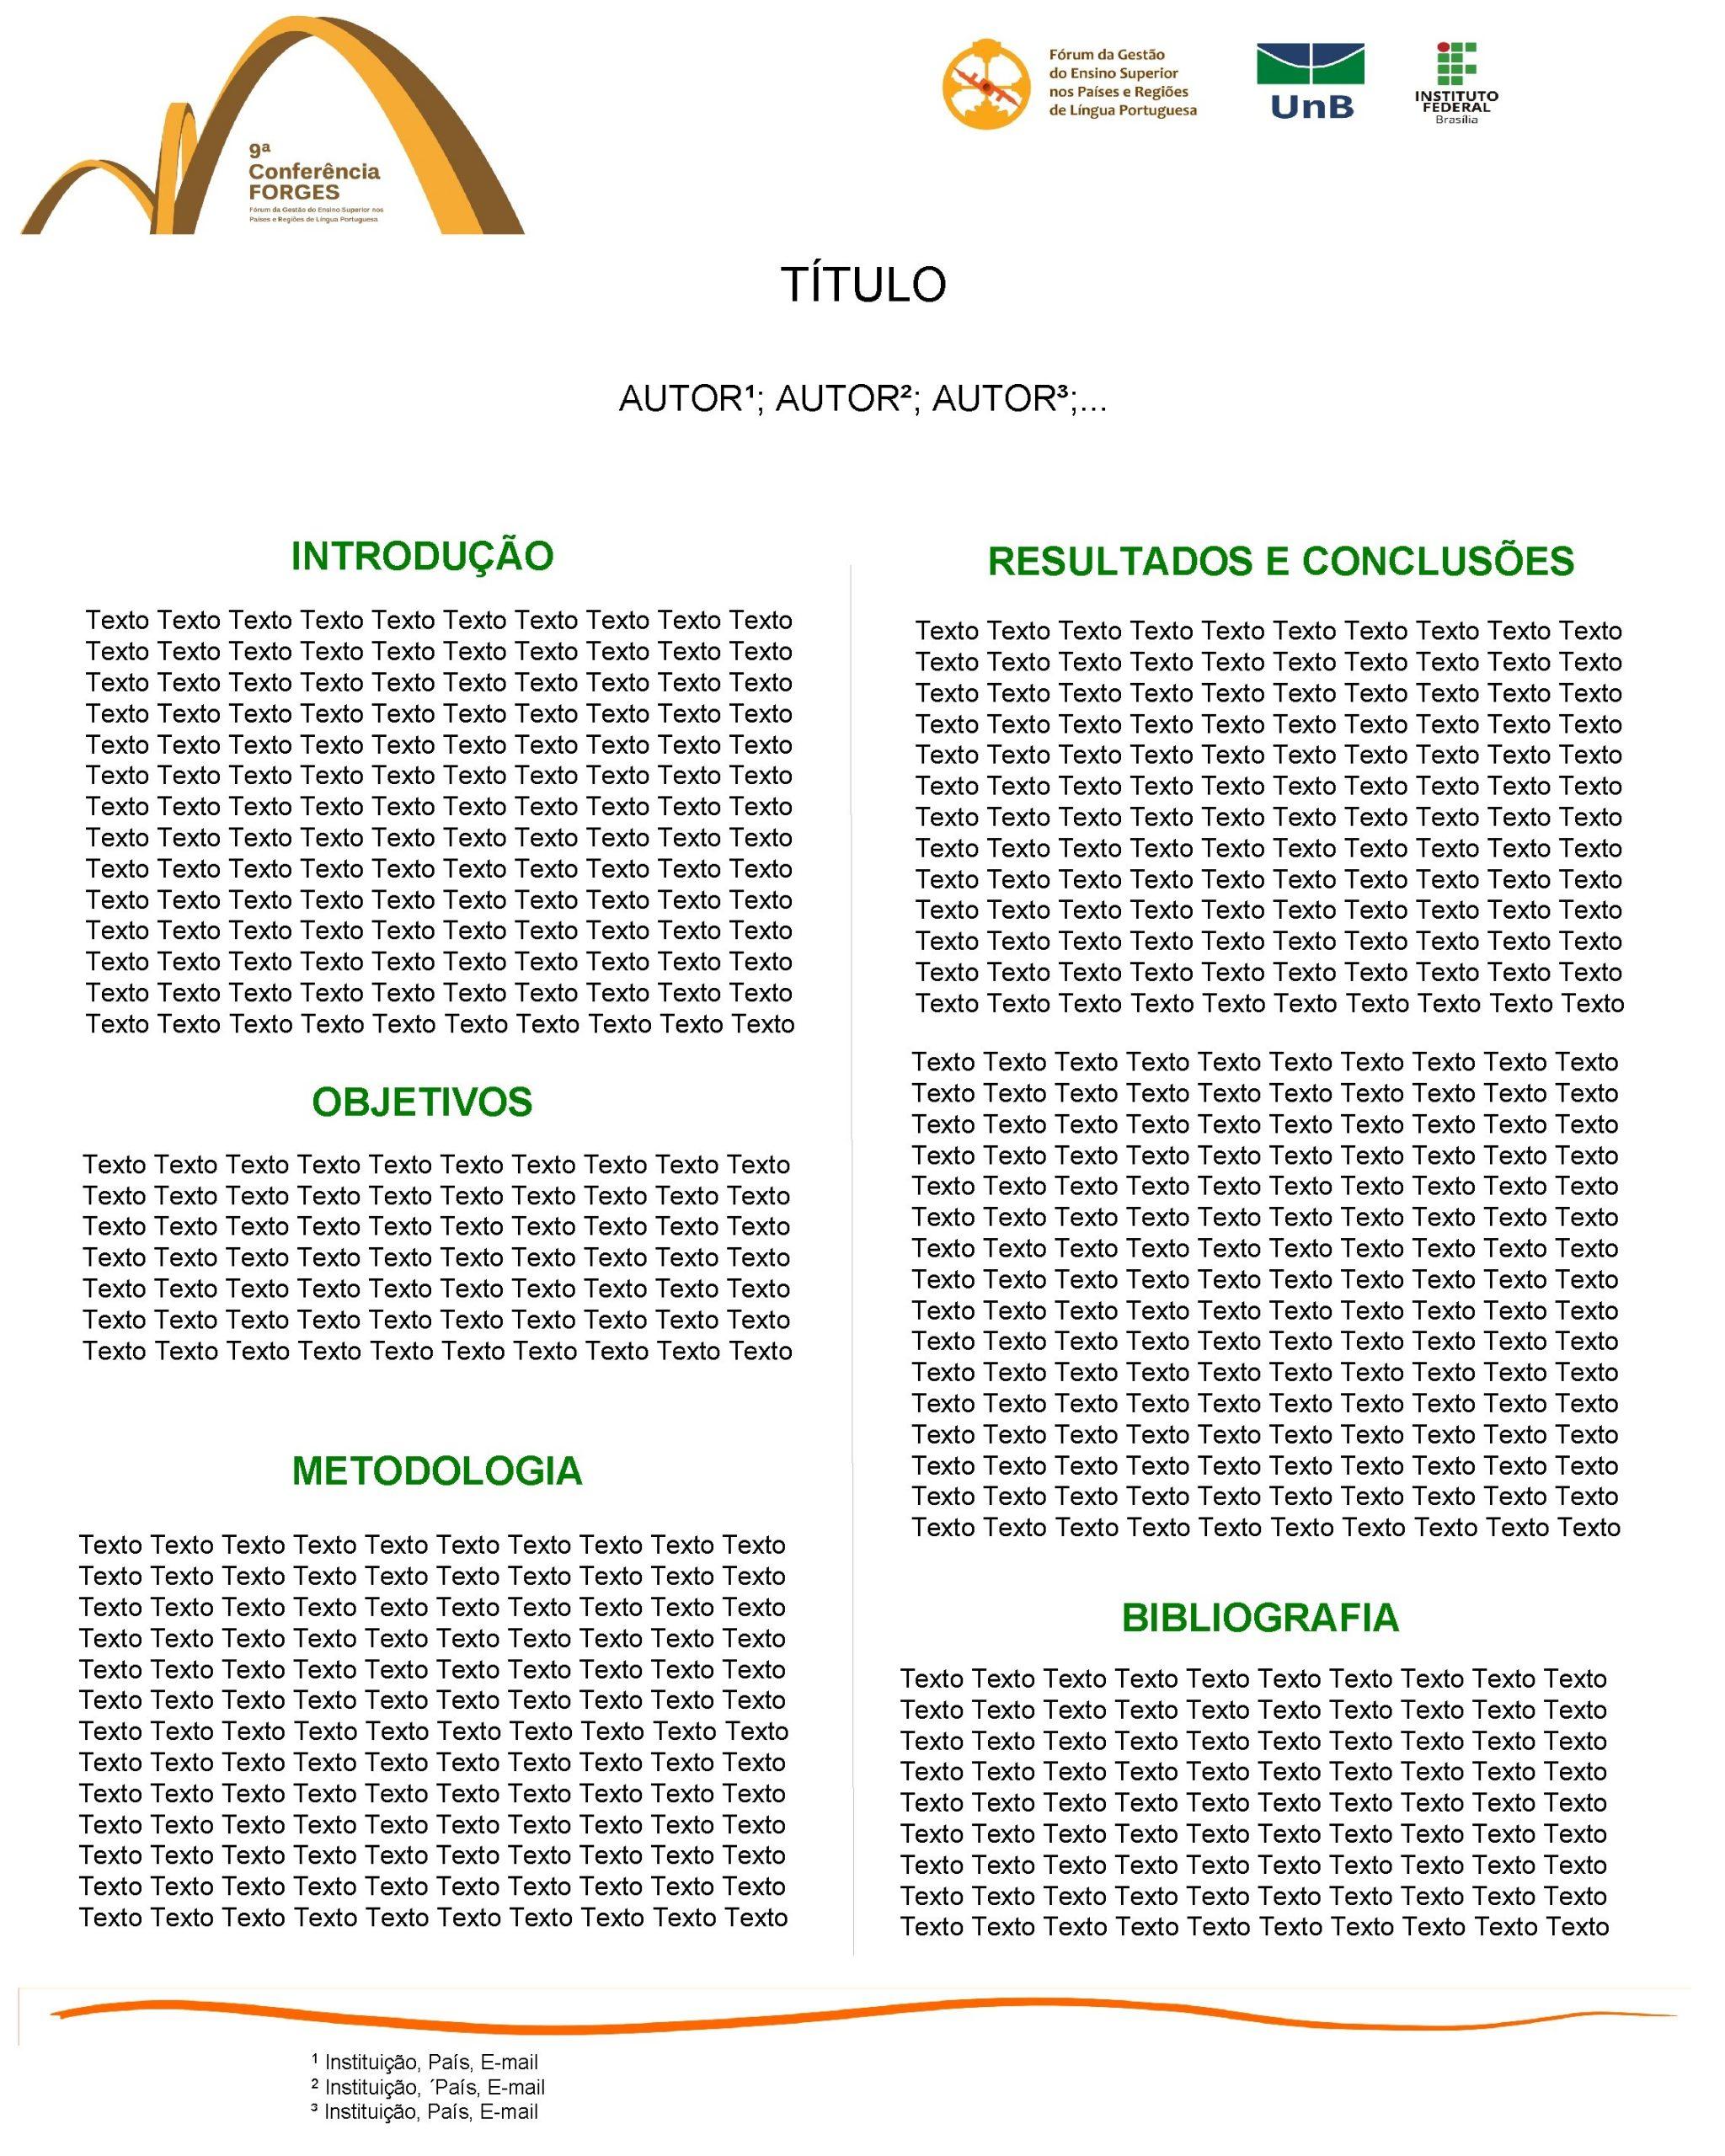 TTULO AUTOR AUTOR AUTOR INTRODUO Texto Texto Texto